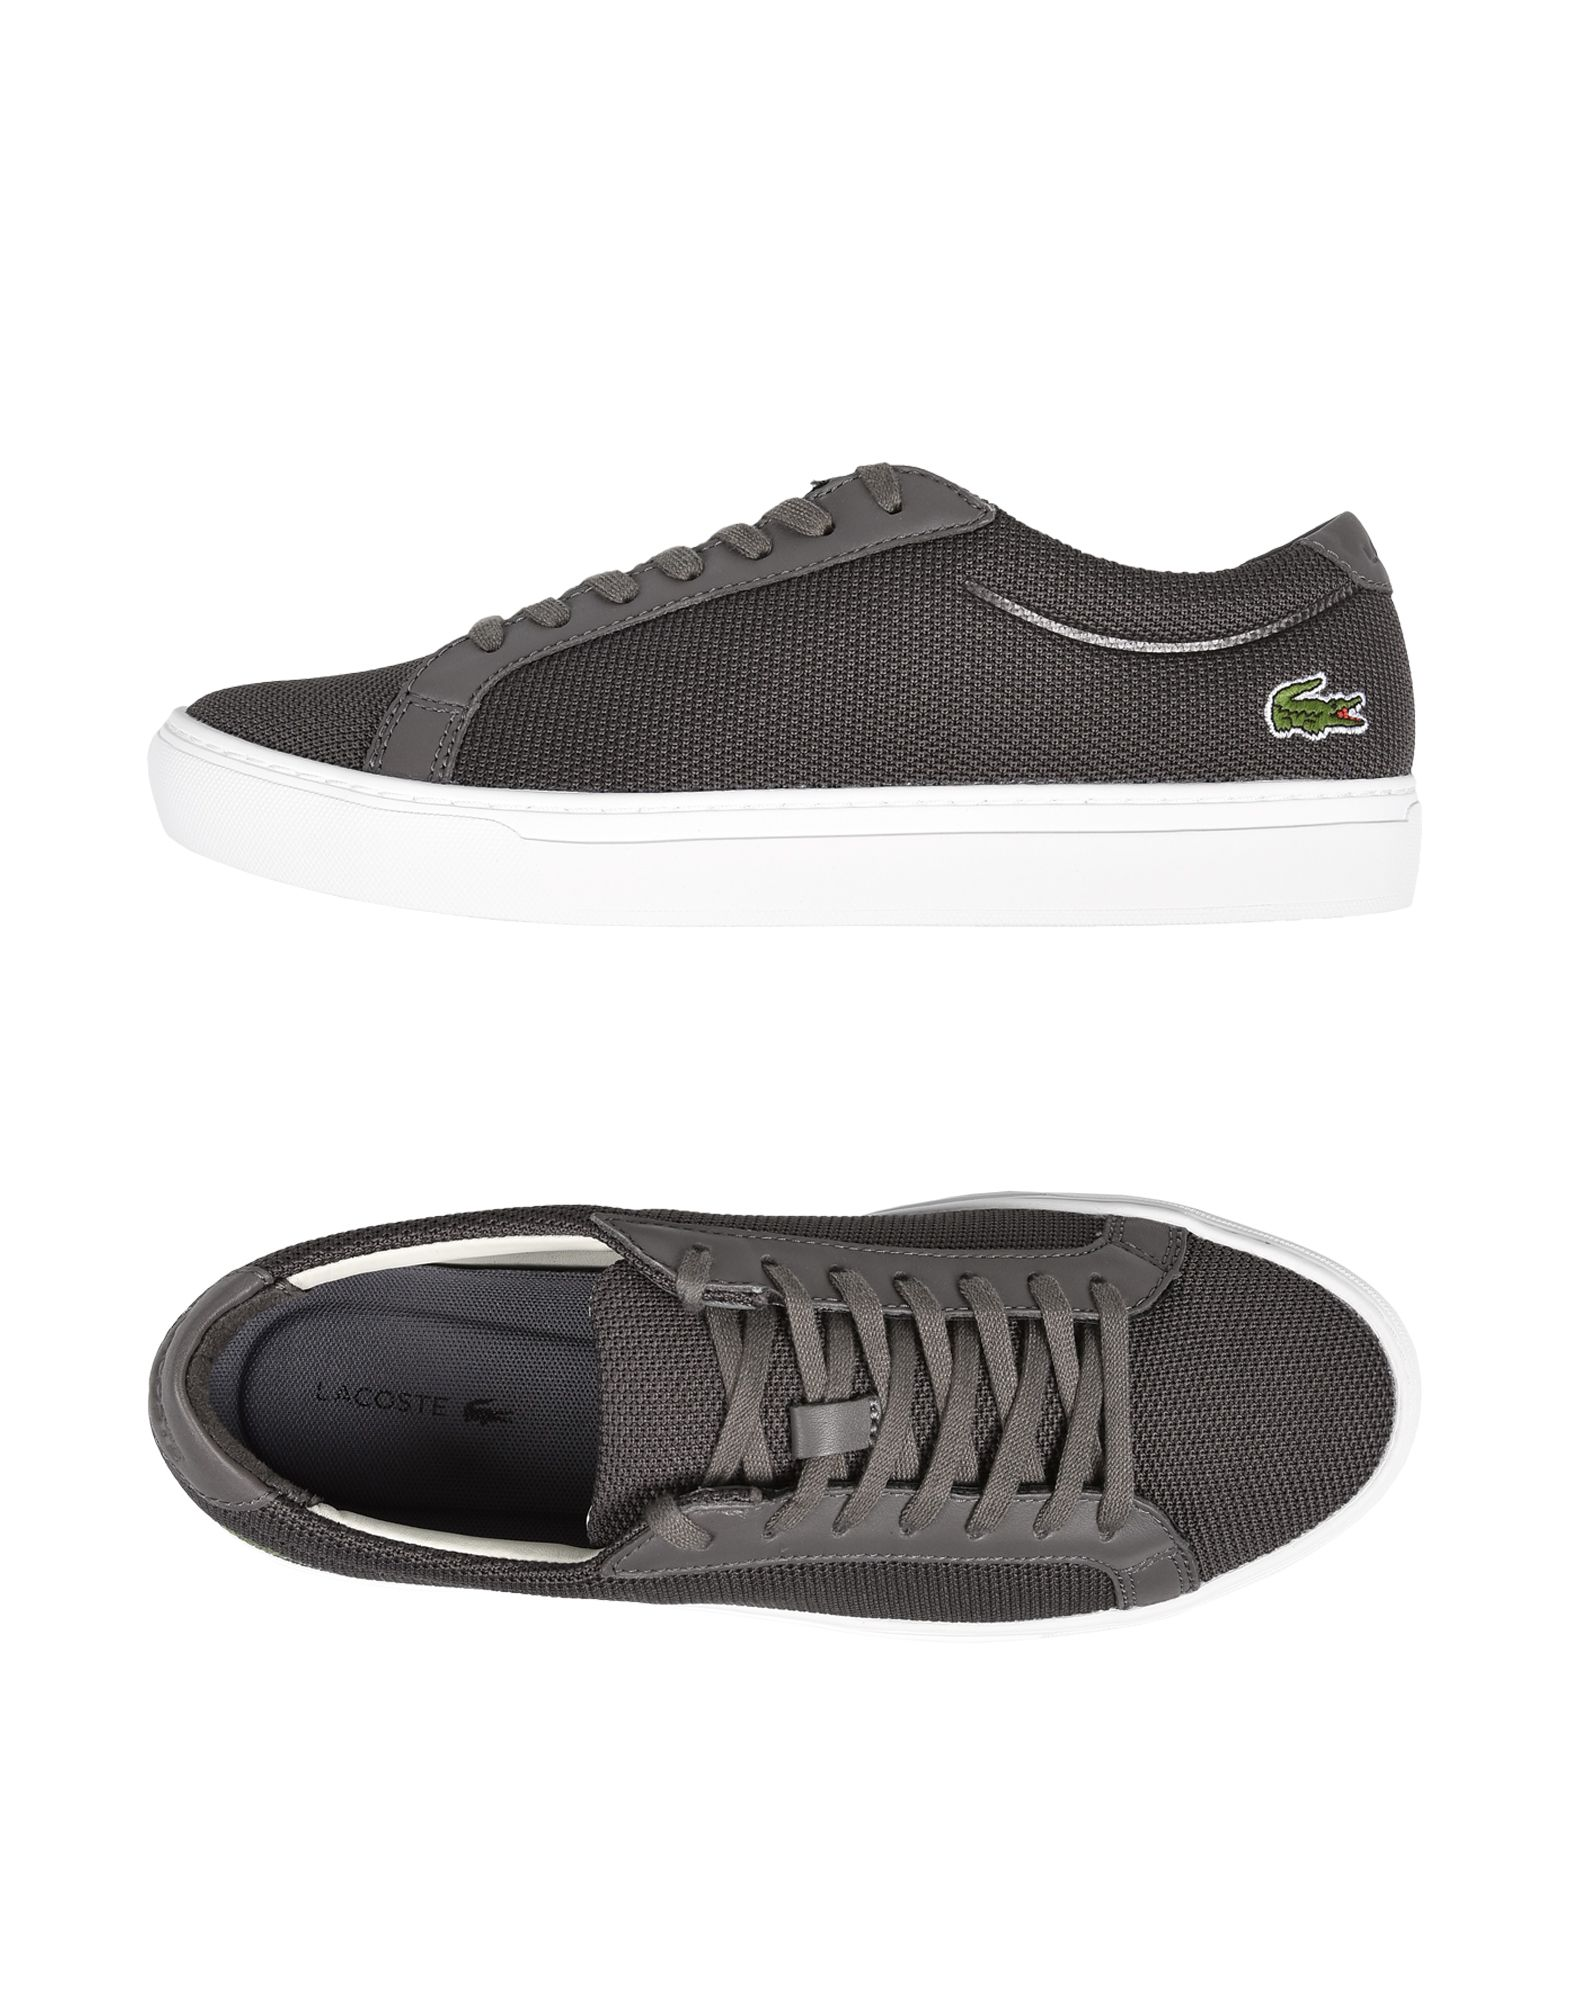 Sneakers - Lacoste L.12.12 117 1 - Uomo - Sneakers 11210879GO 0bafd9